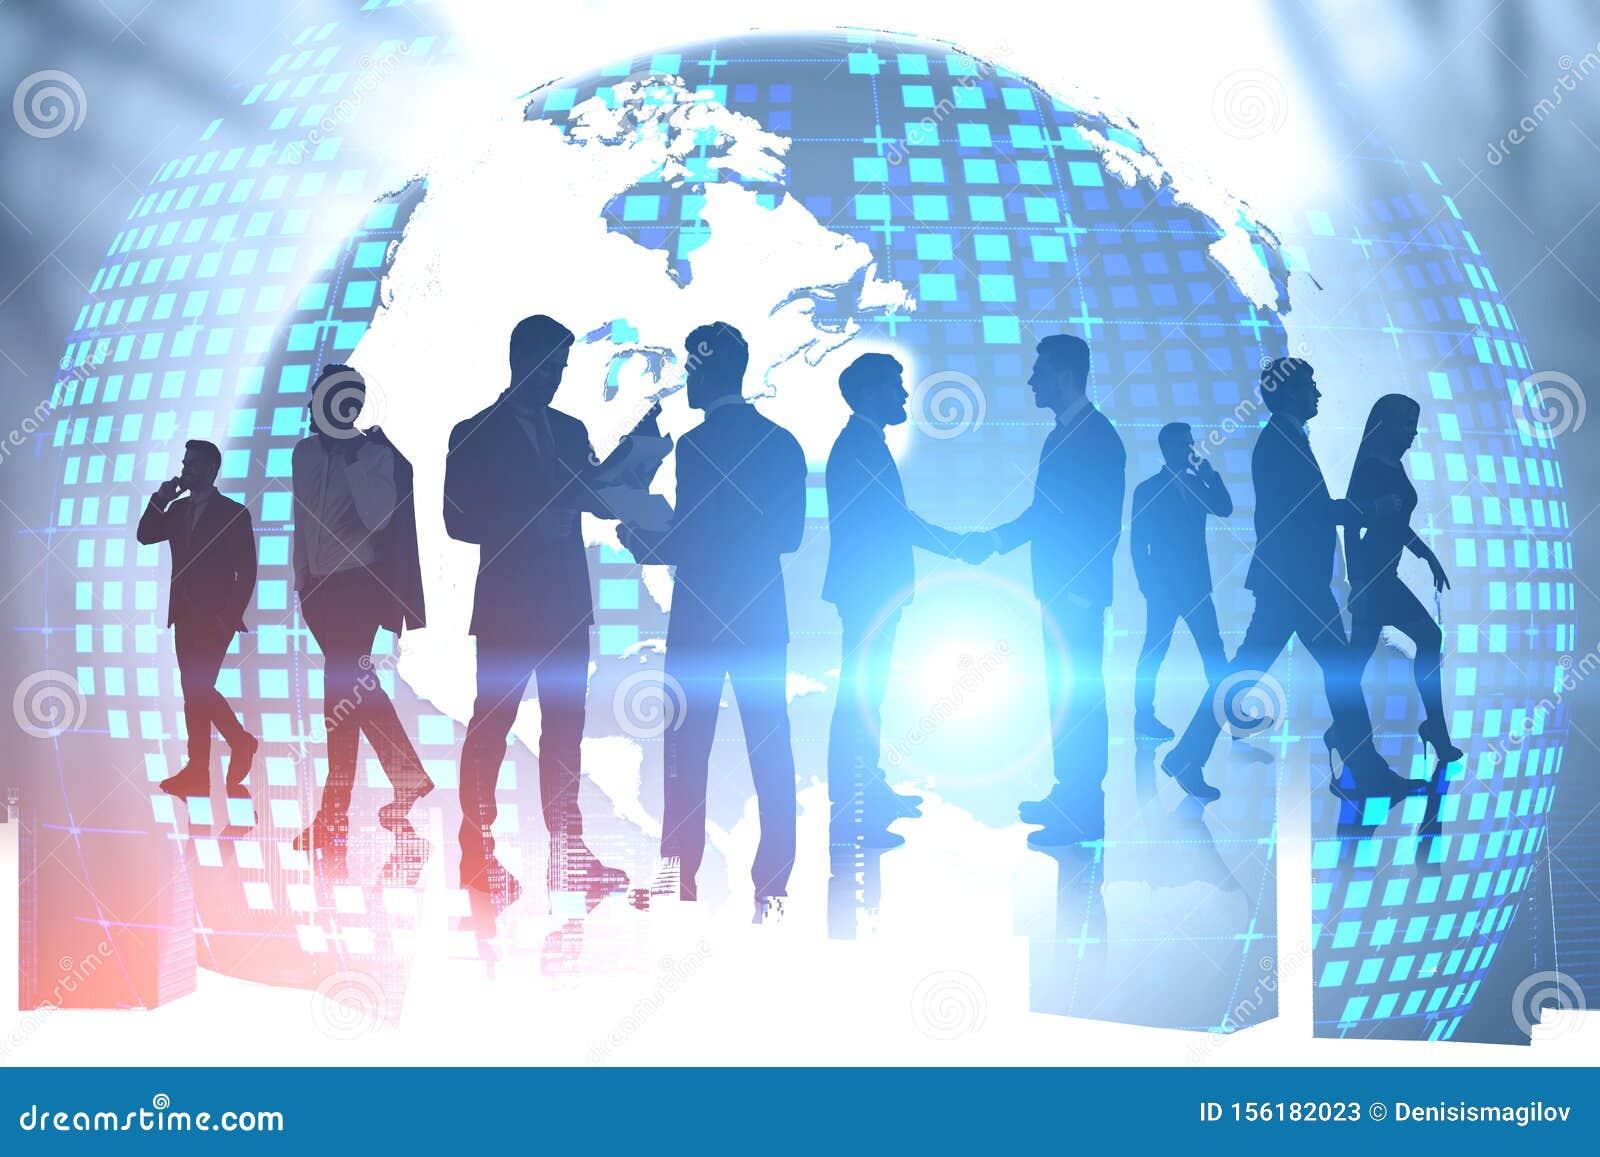 Business people and international partnership